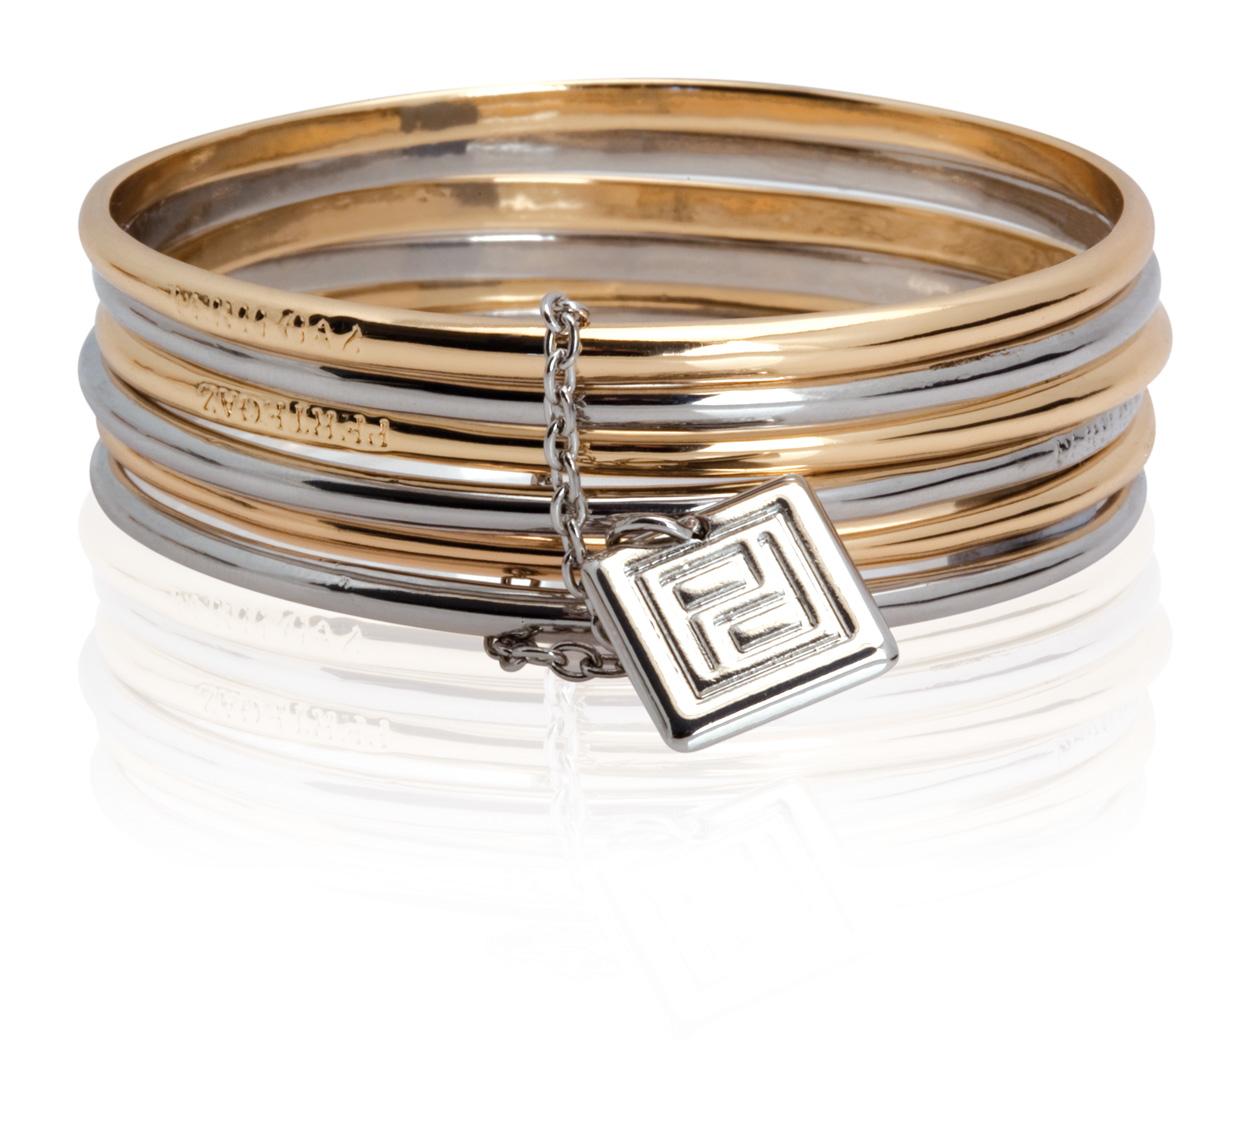 Cercles bracelet